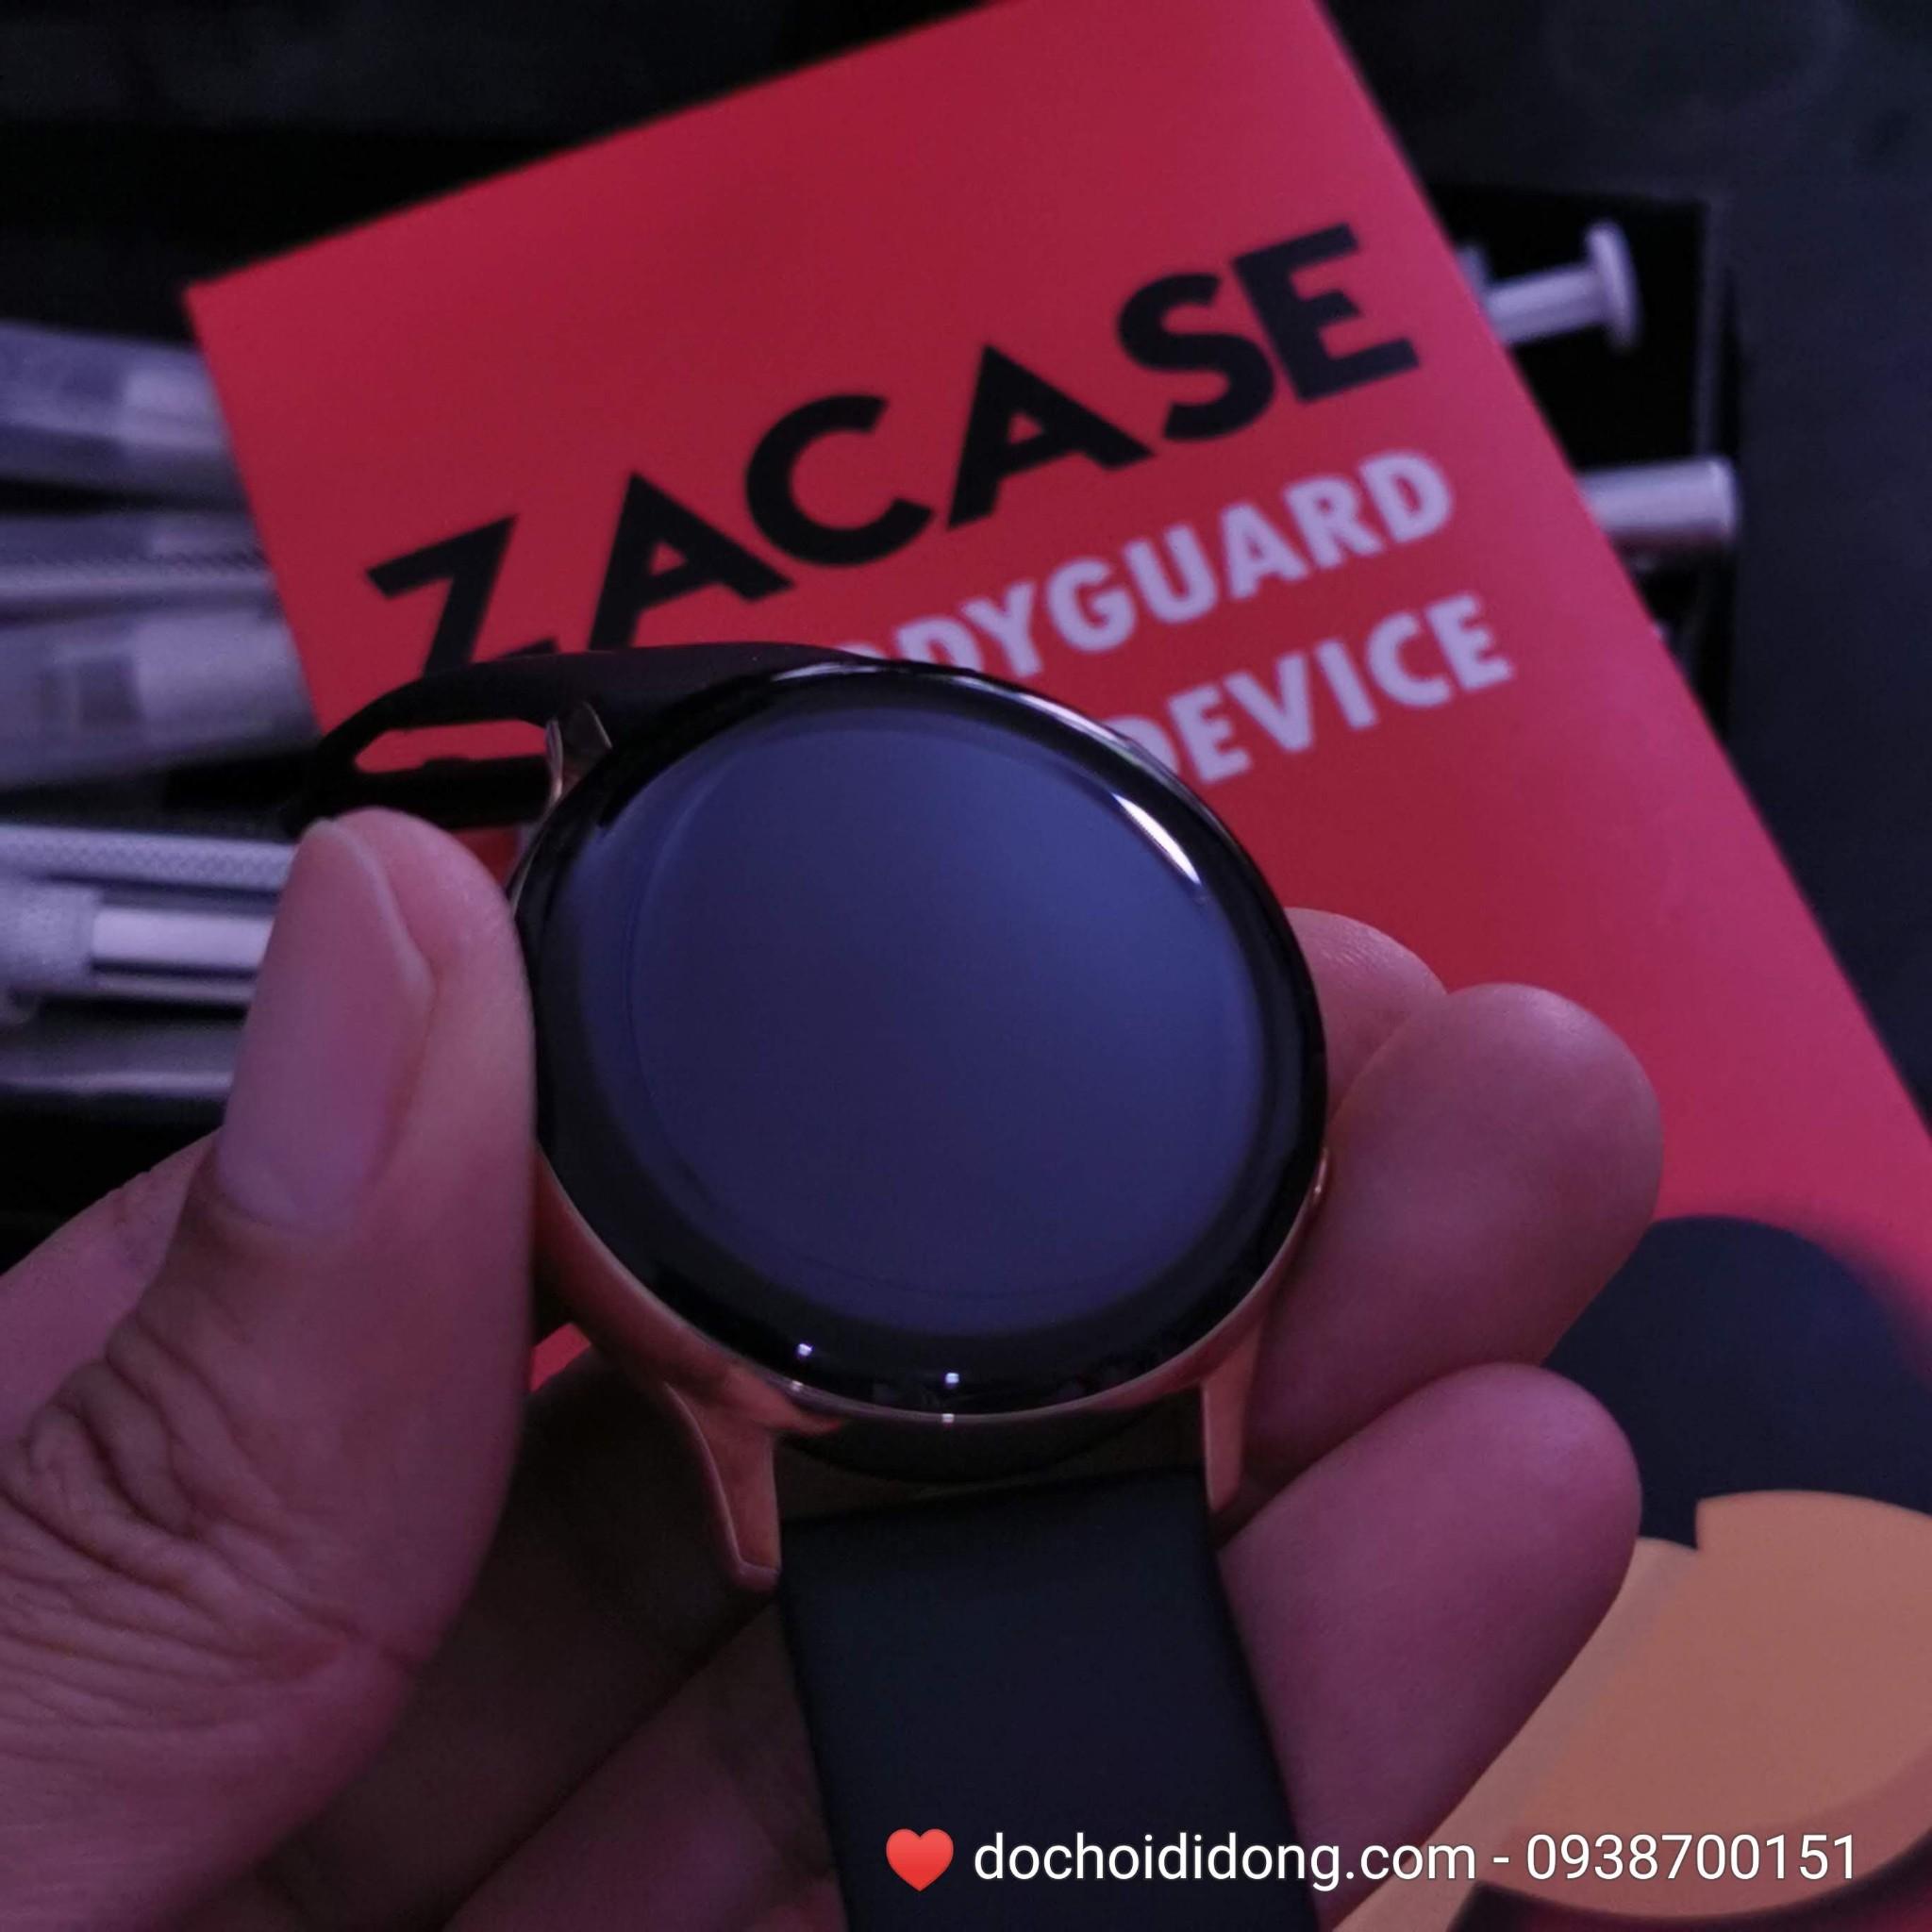 dan-cuong-luc-dong-ho-samsung-galaxy-watch-active-zacase-full-keo